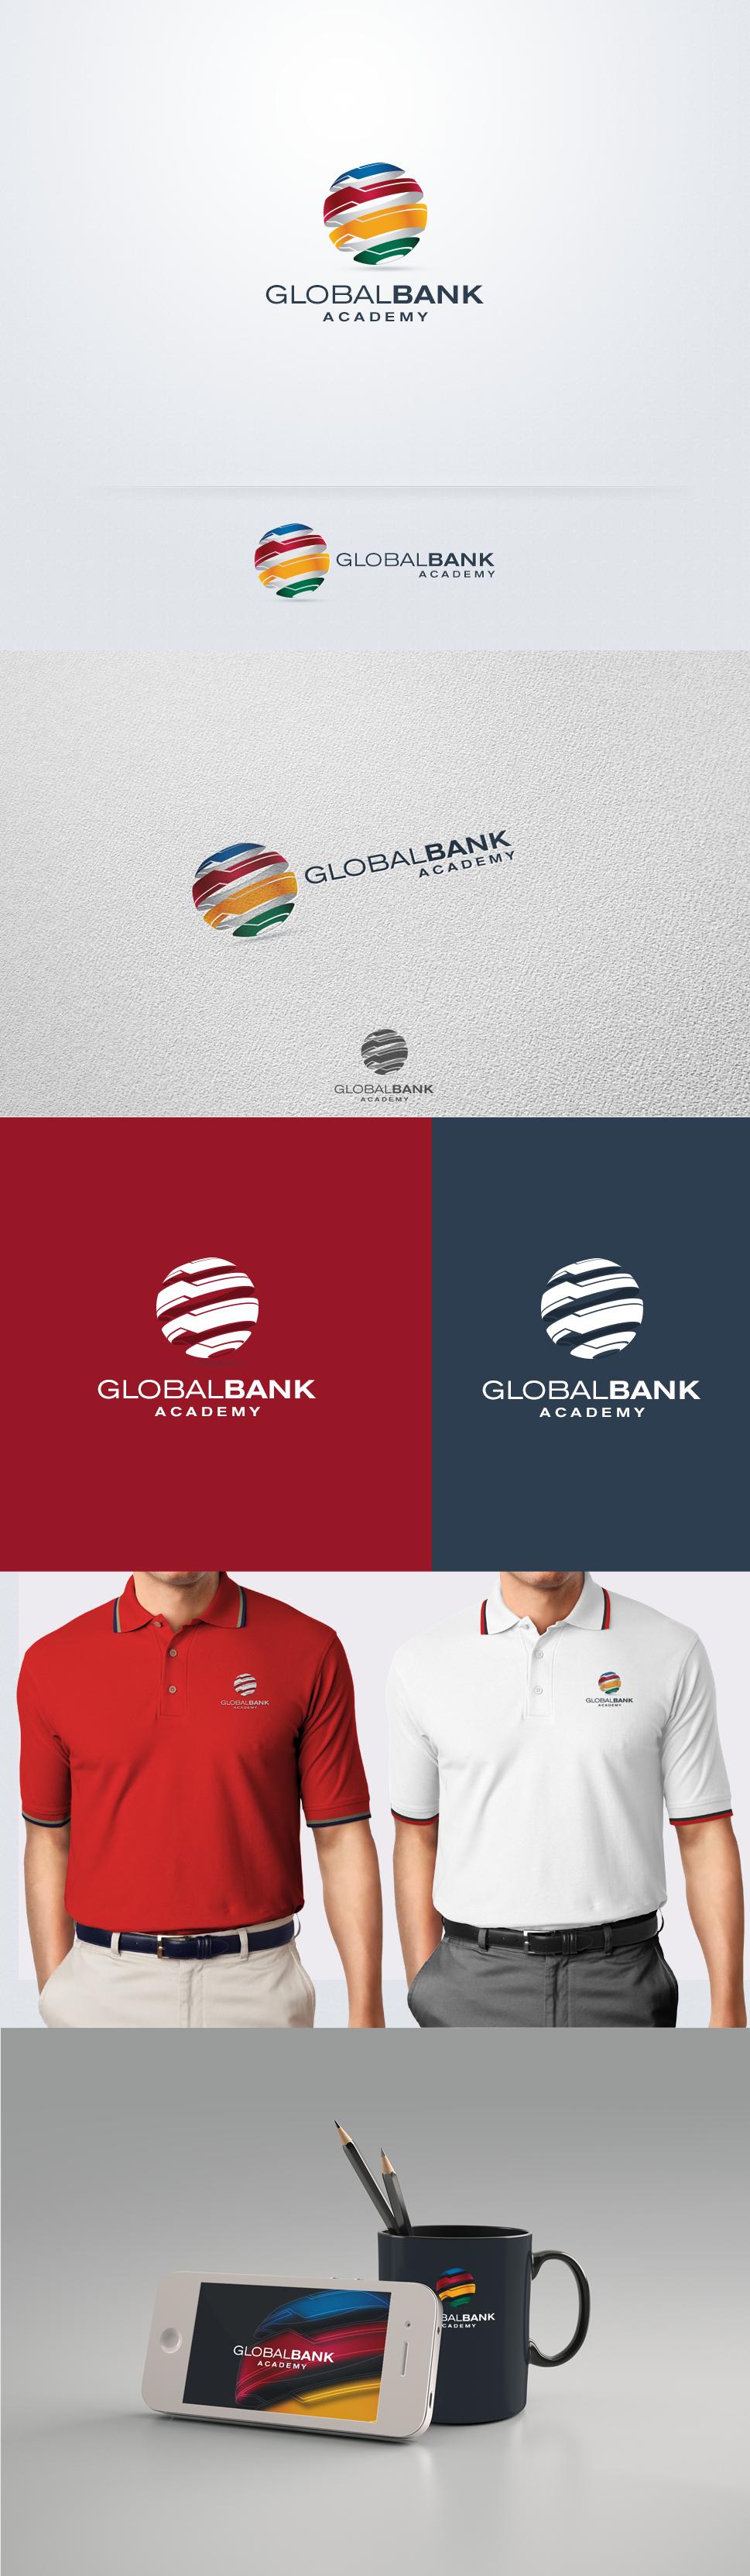 Design the Next Billion Dollar Brand! GLOBAL BANK ACADEMY